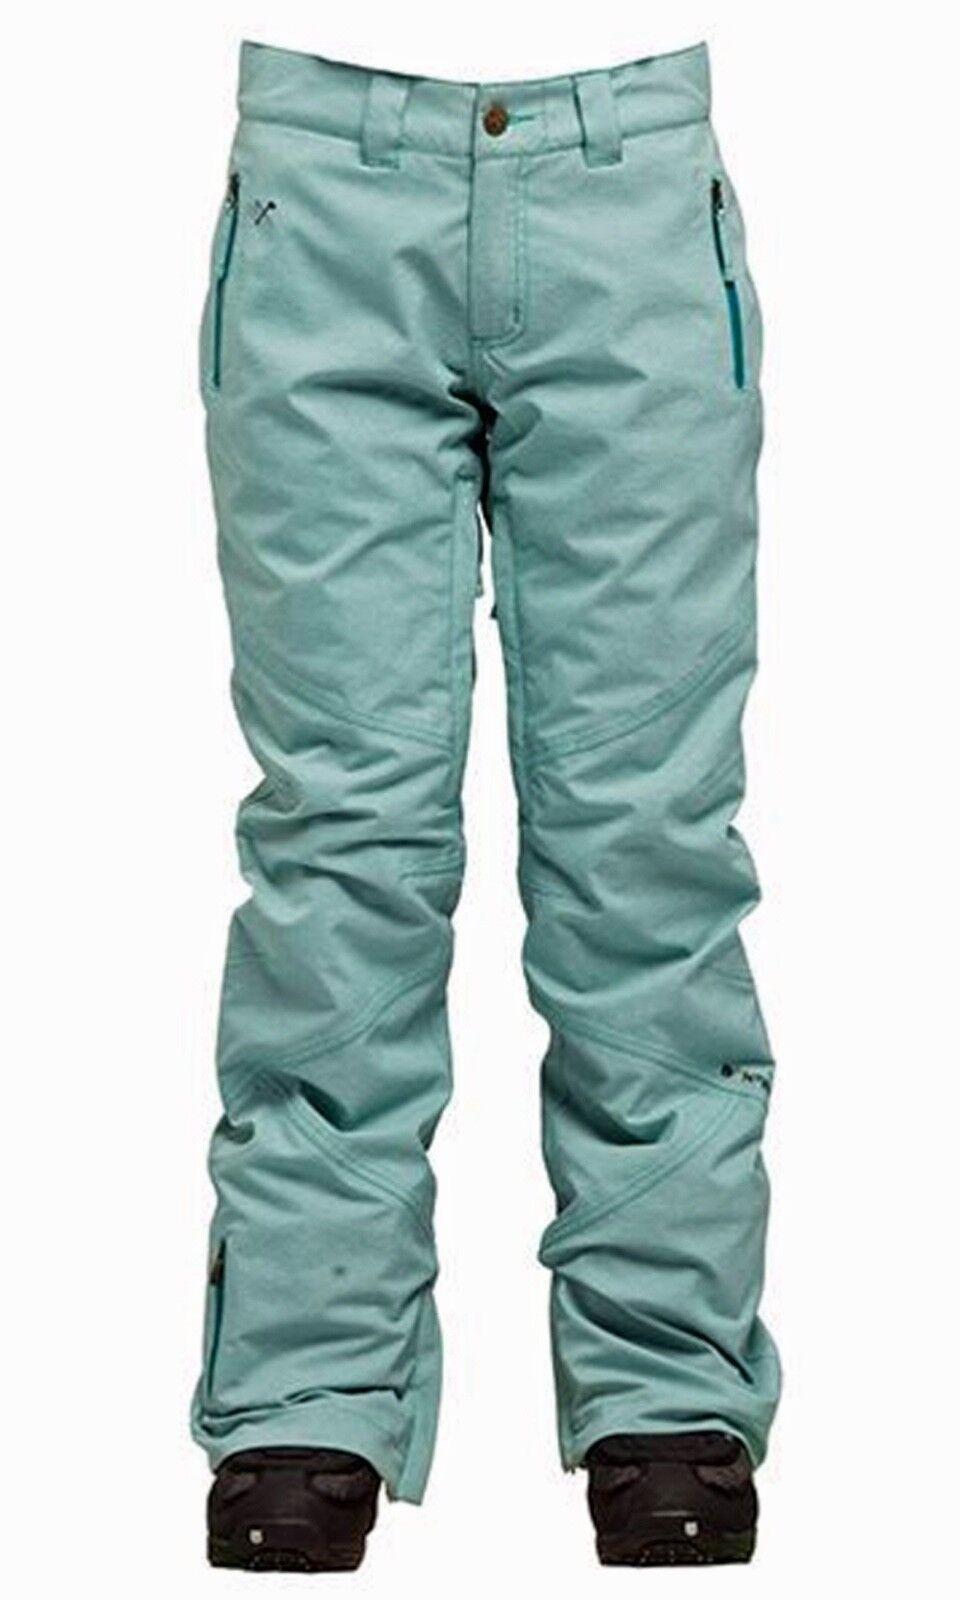 Bonfire Rubí Pantalones Lake azul Pantalones de Snowboard Talla XS